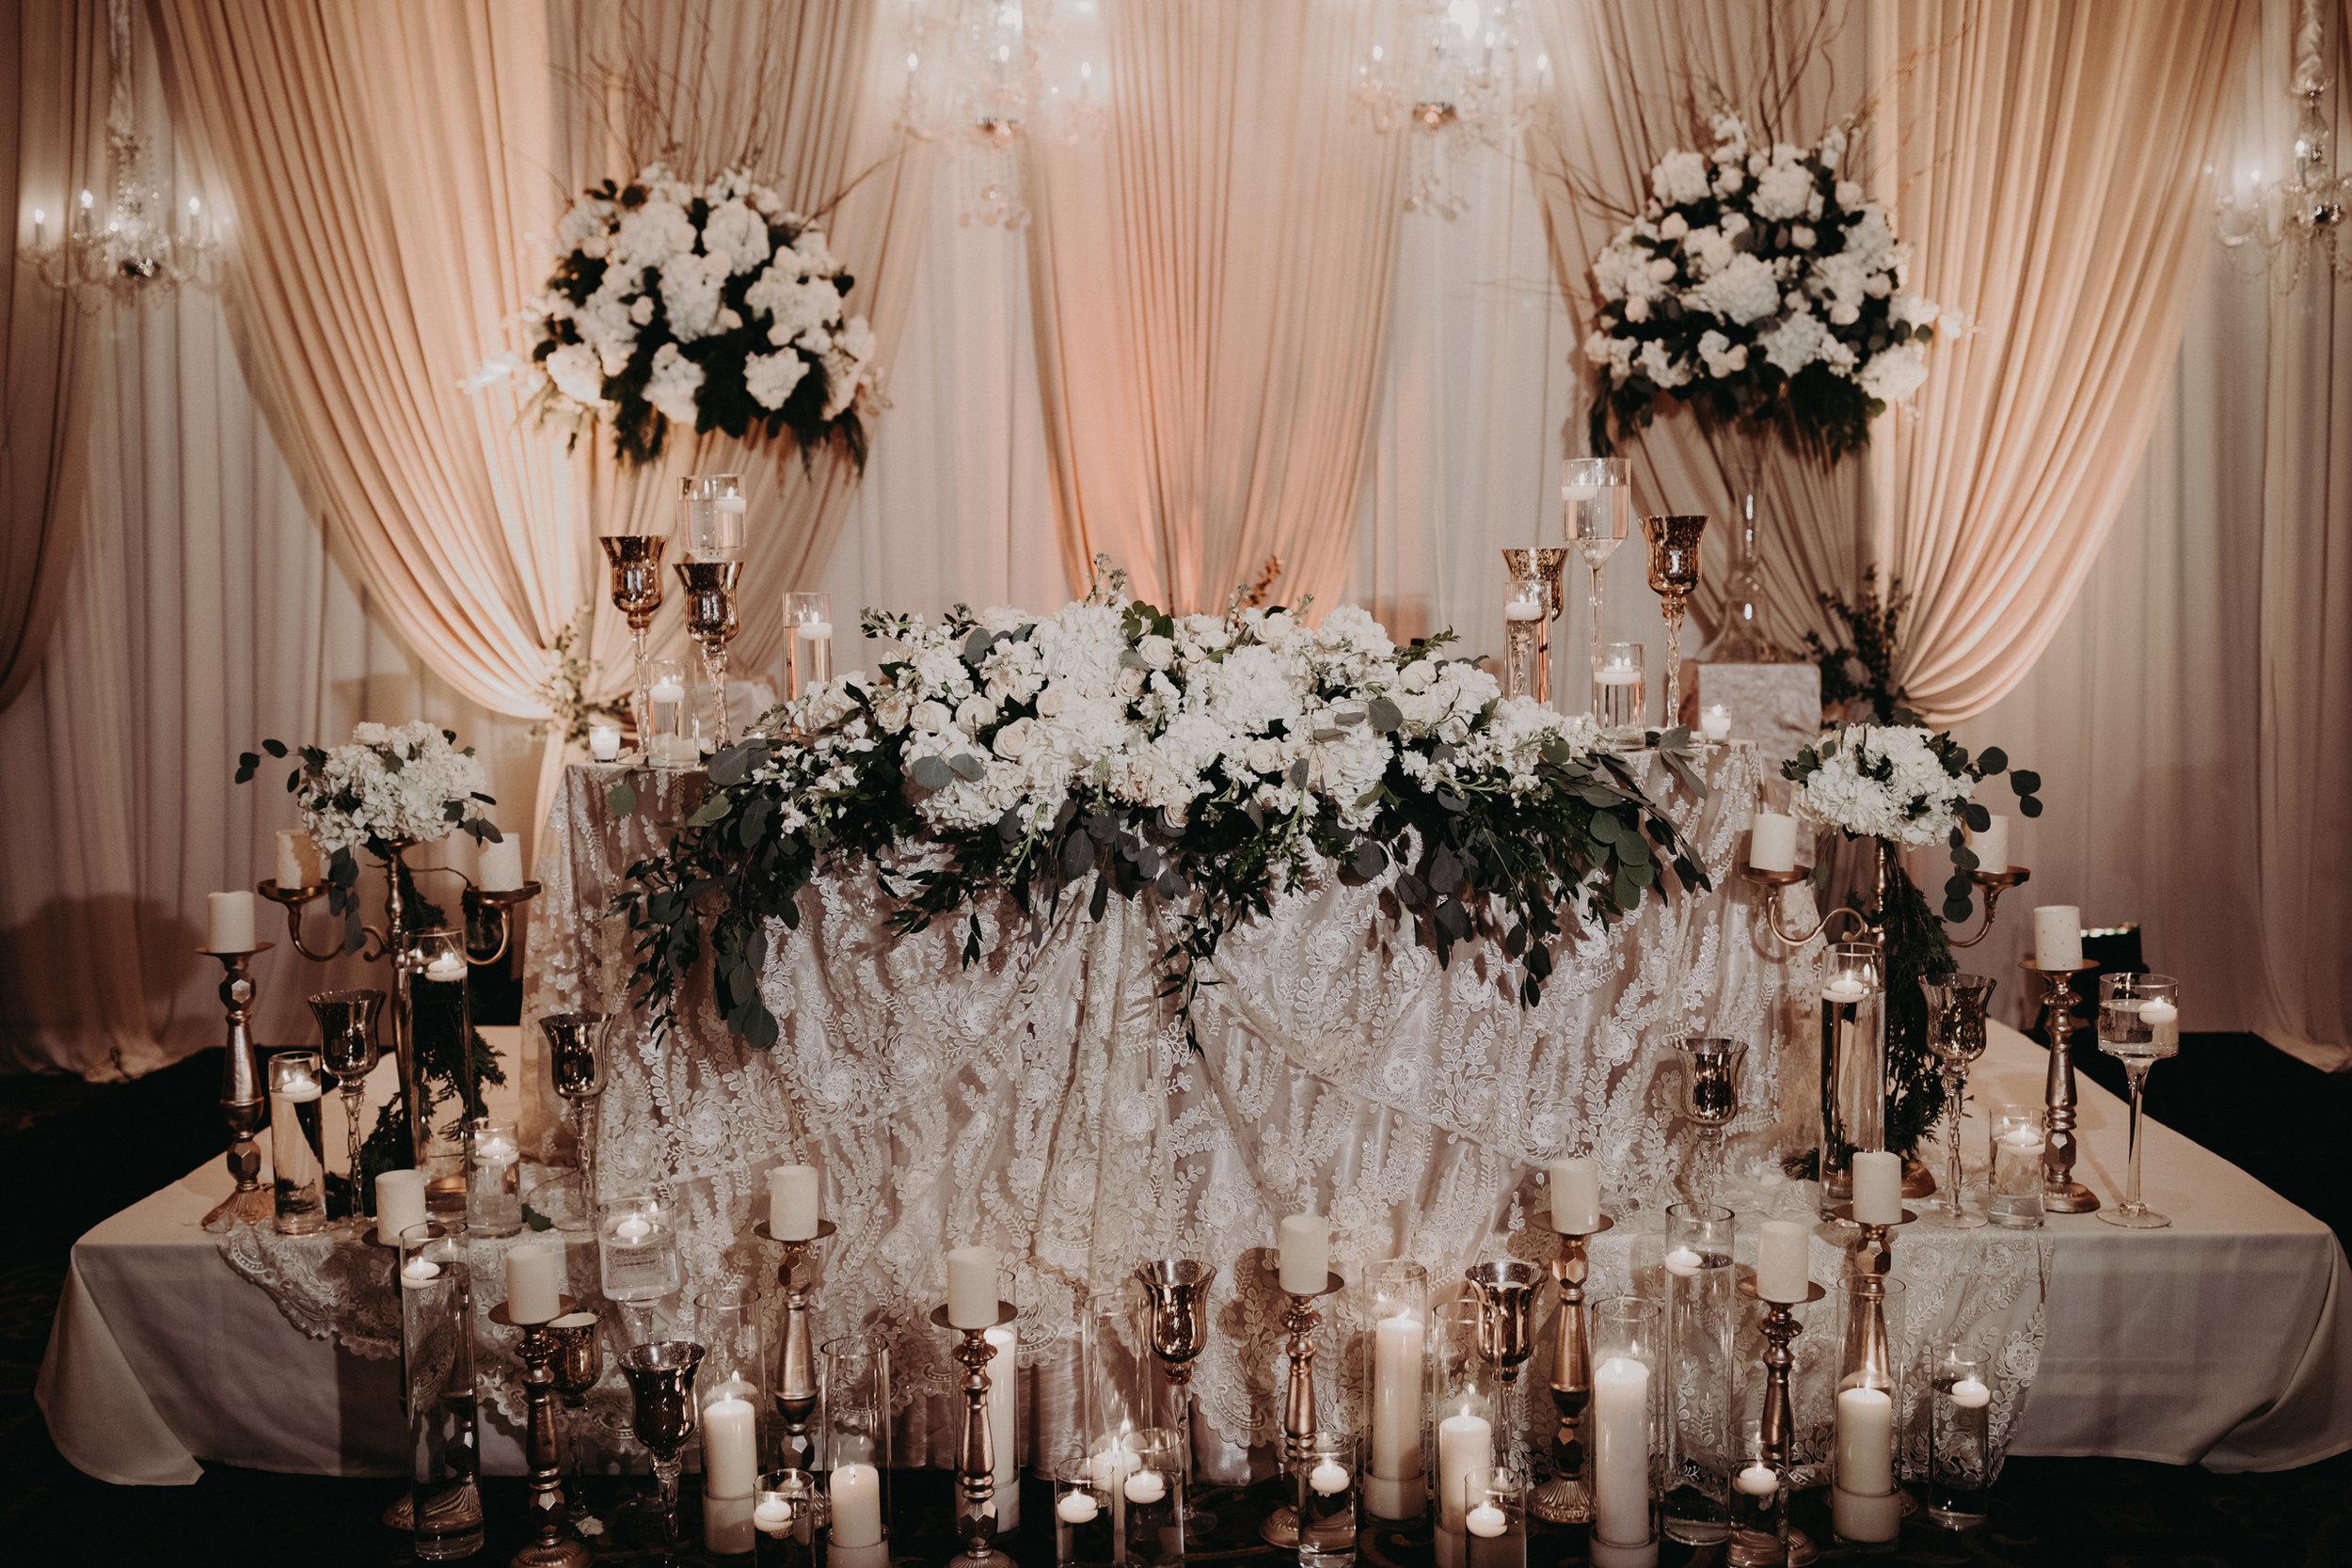 (0875) Maria + Vince (Wedding).jpg